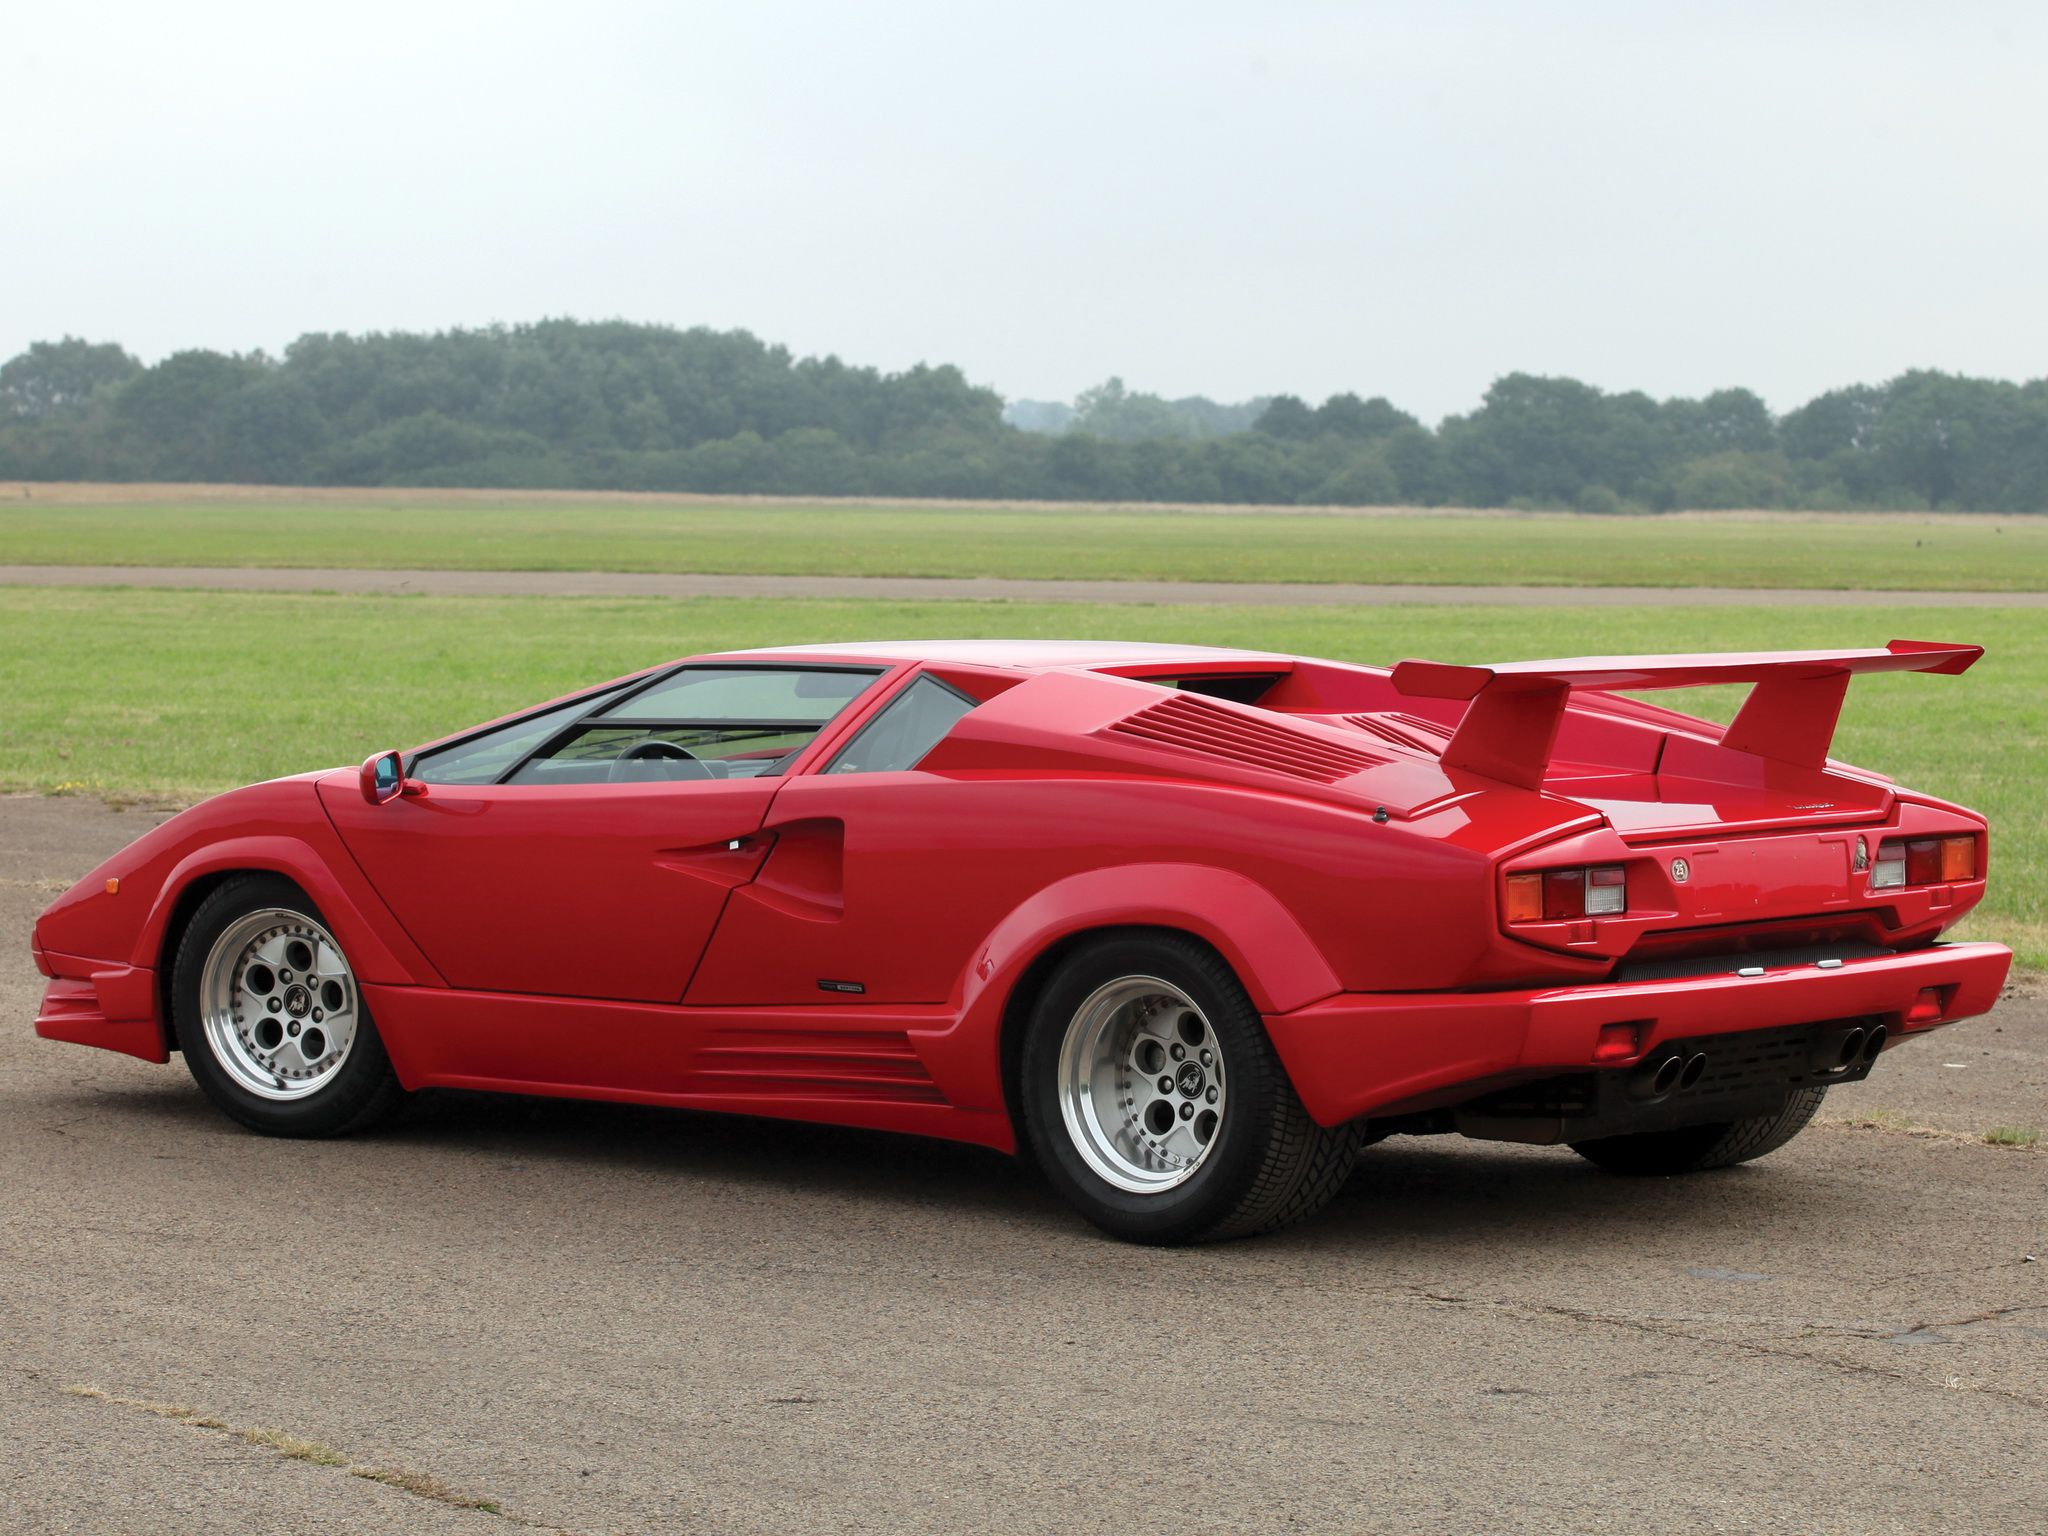 5dcc260d176796bce1bcab2acf1c7f76 Elegant Lamborghini Countach 25th Anniversary Specs Cars Trend